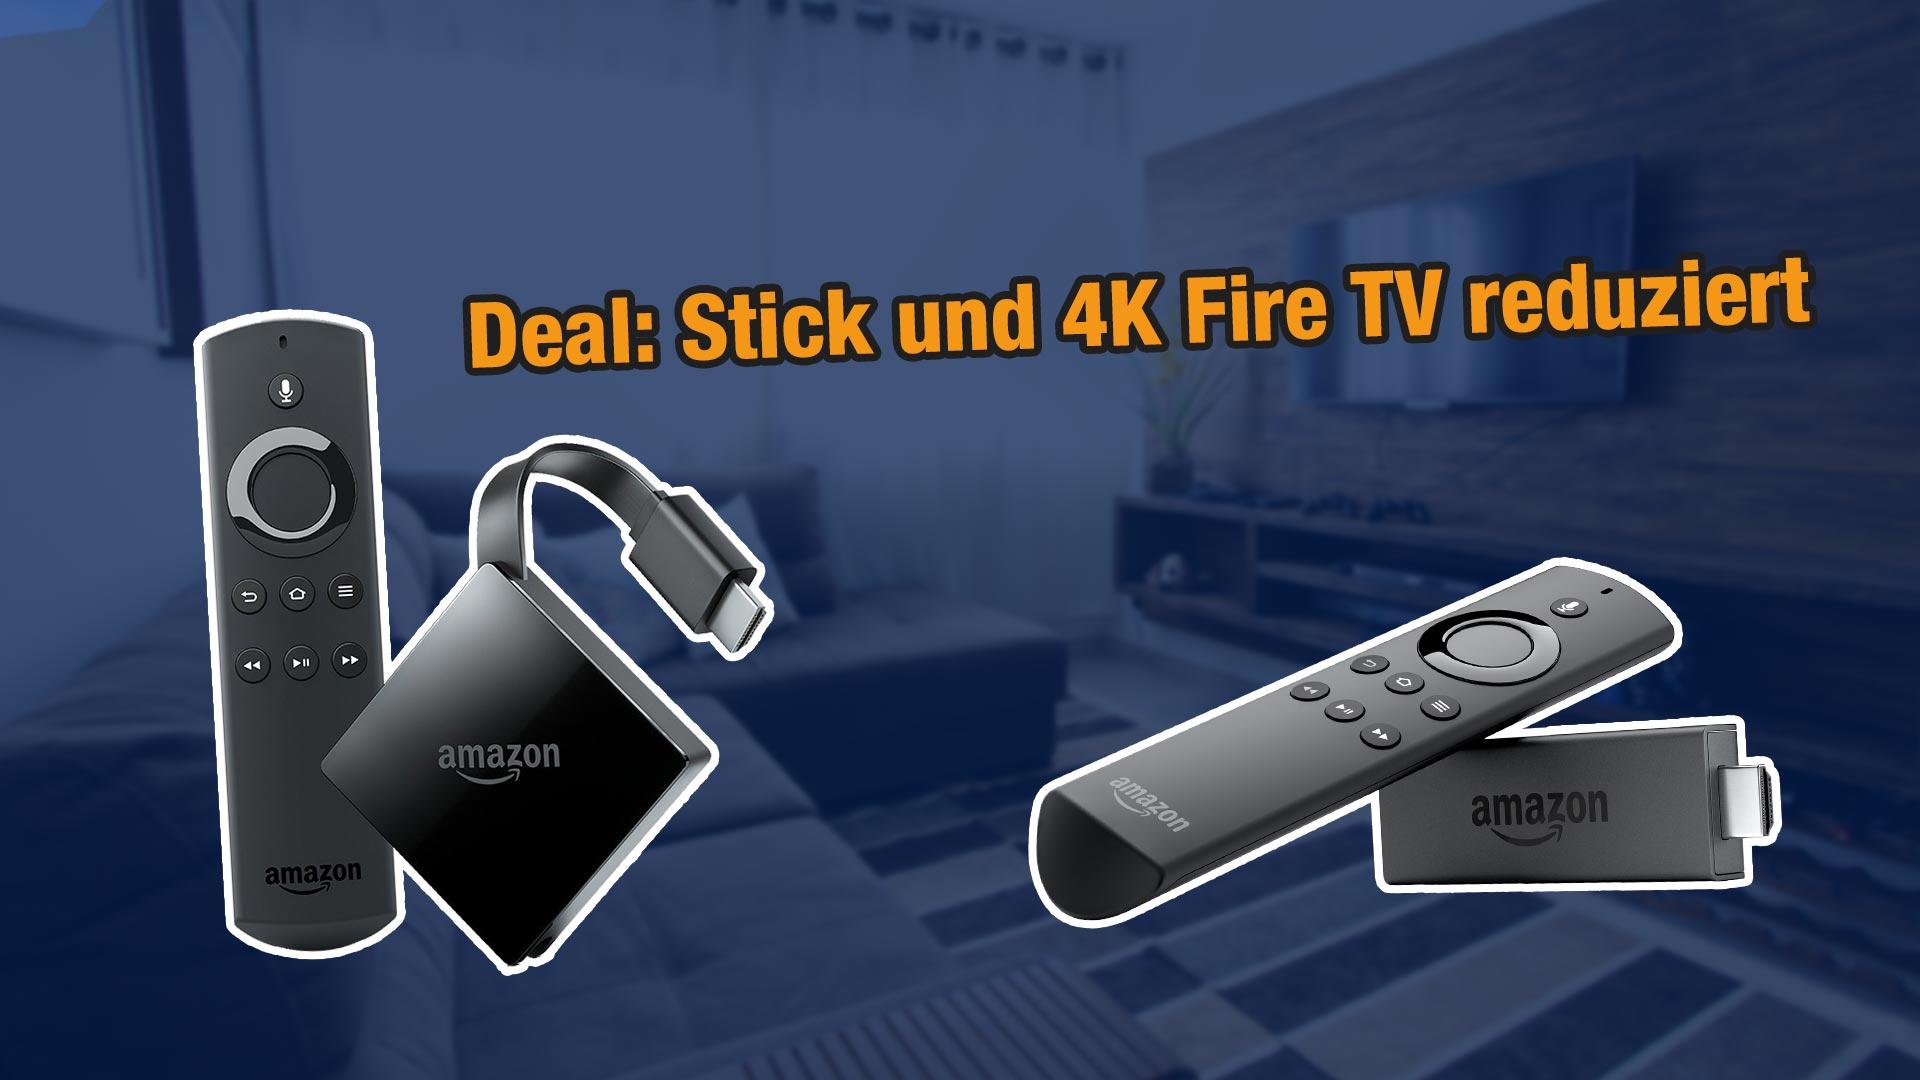 deal fire tv stick 2 und 4k fire tv 3 aktuell bei amazon. Black Bedroom Furniture Sets. Home Design Ideas